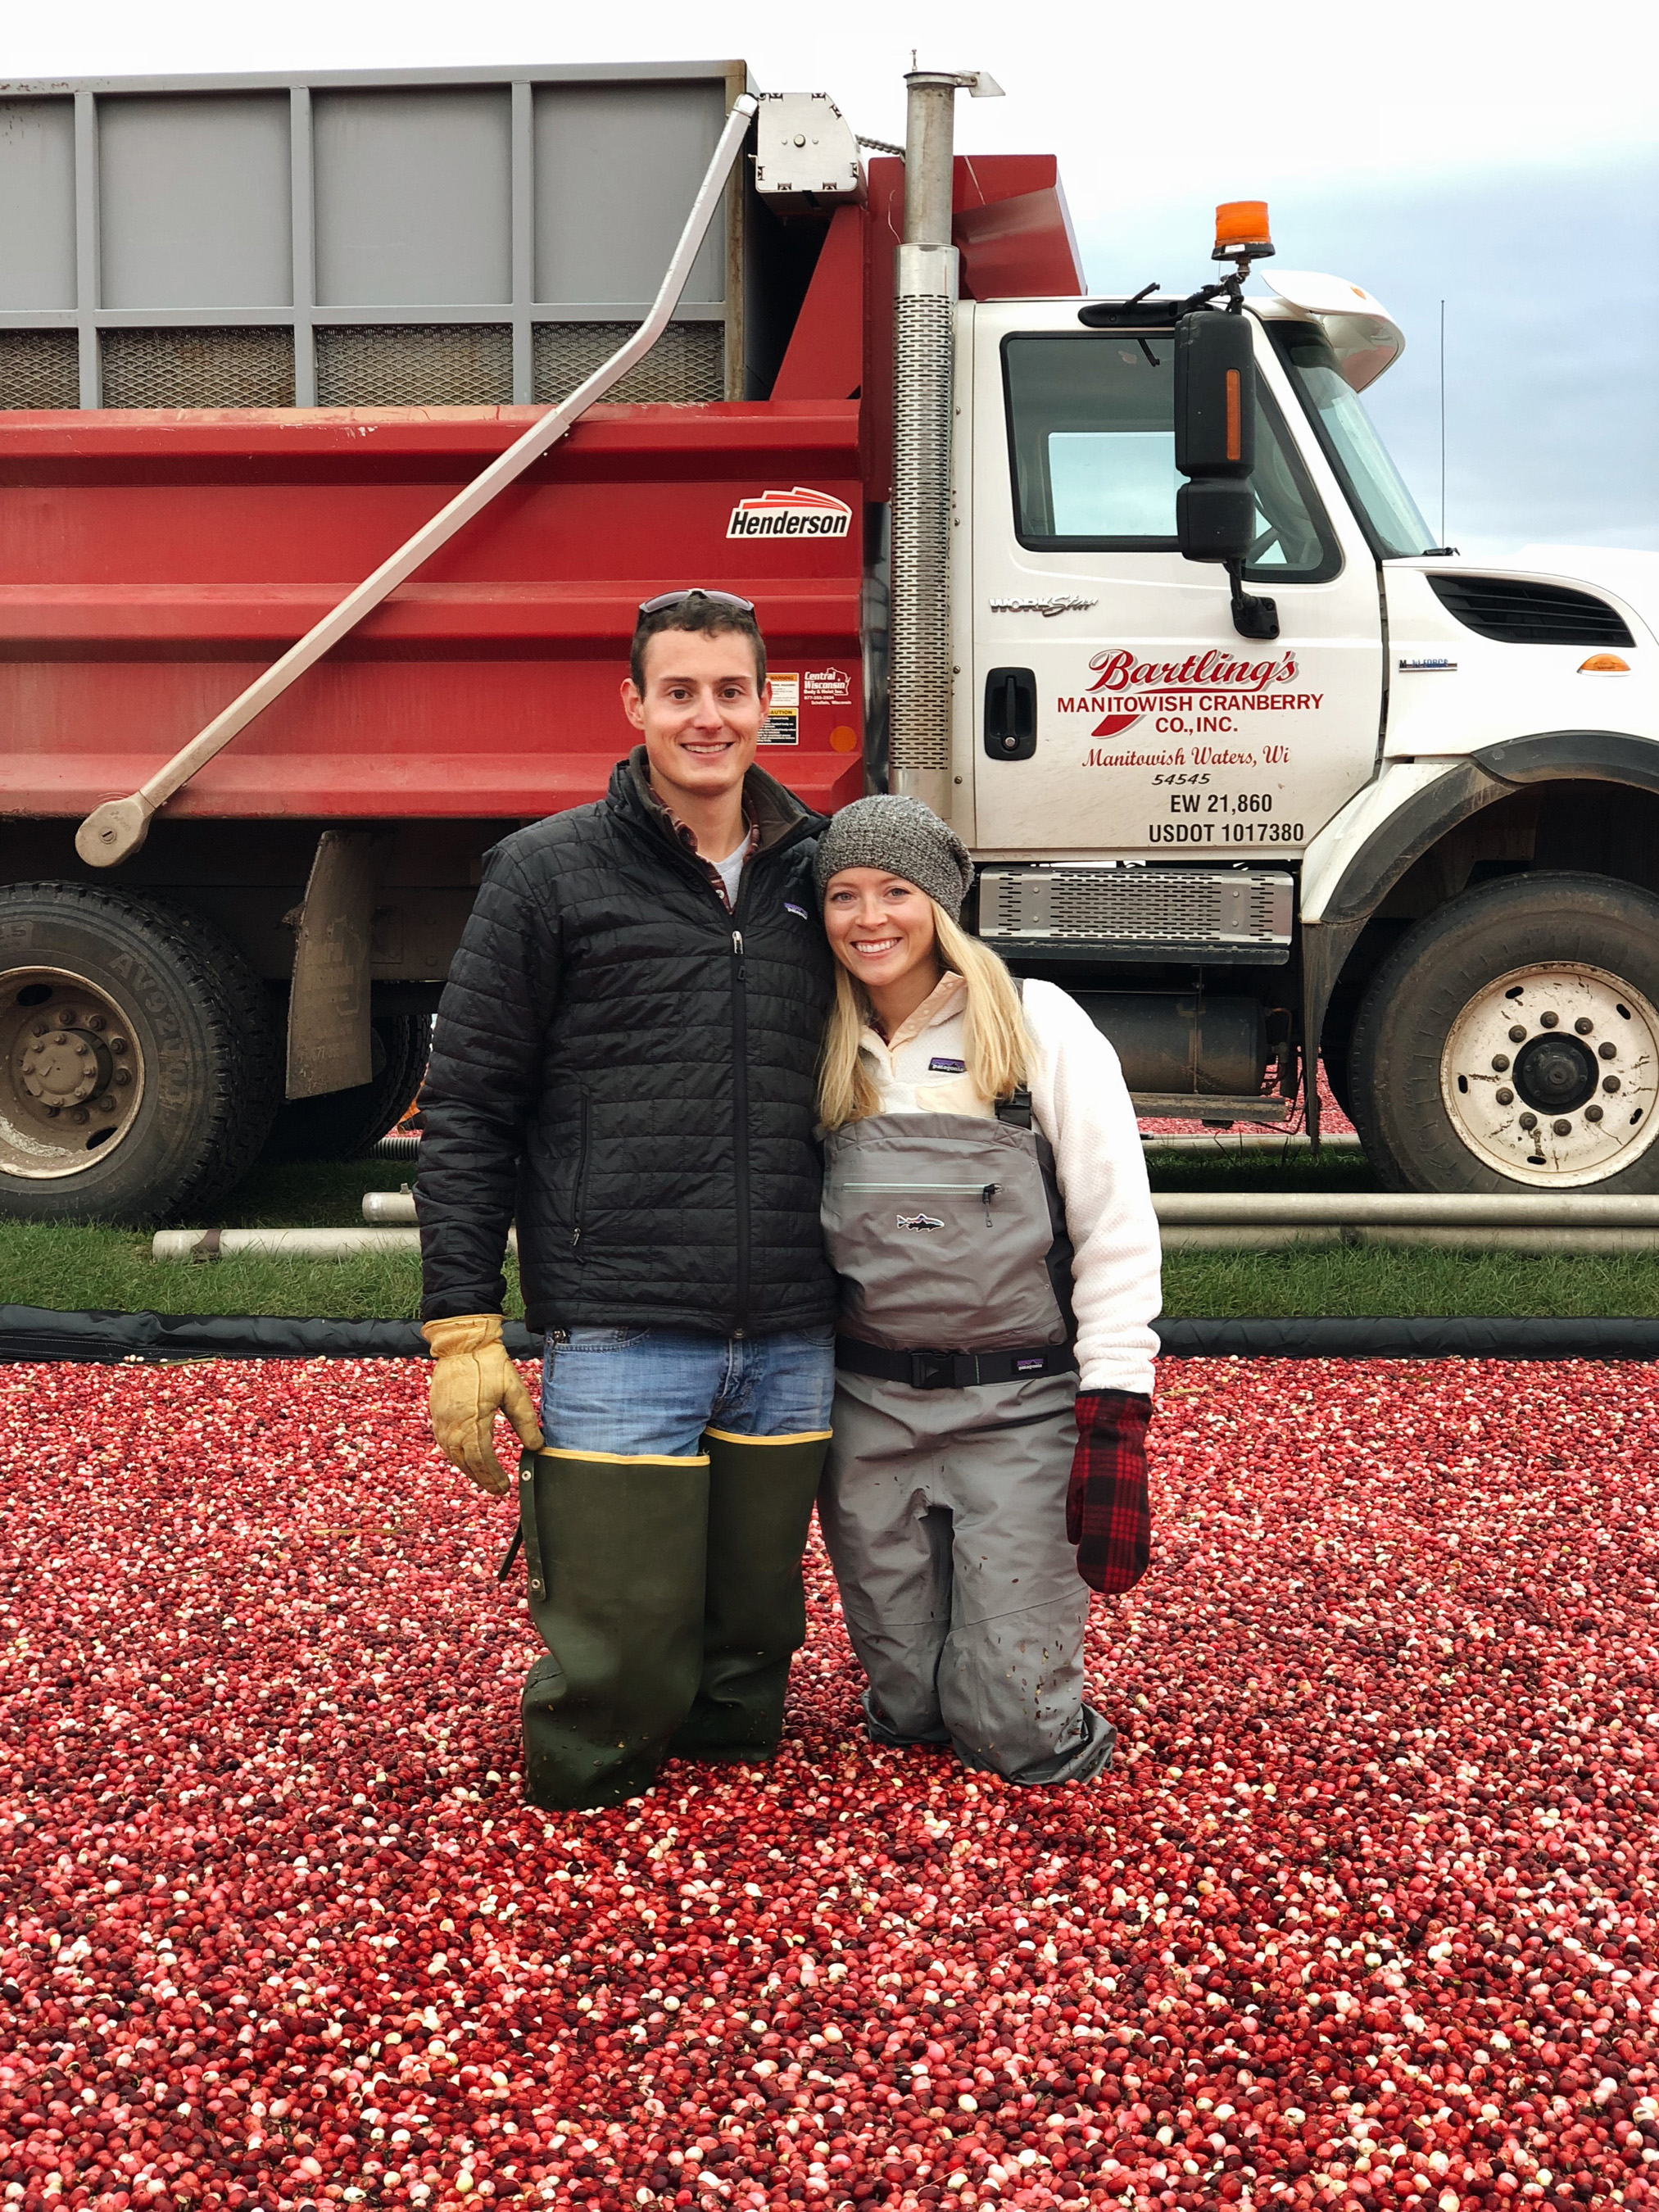 David and Becca Harvesting Cranberries